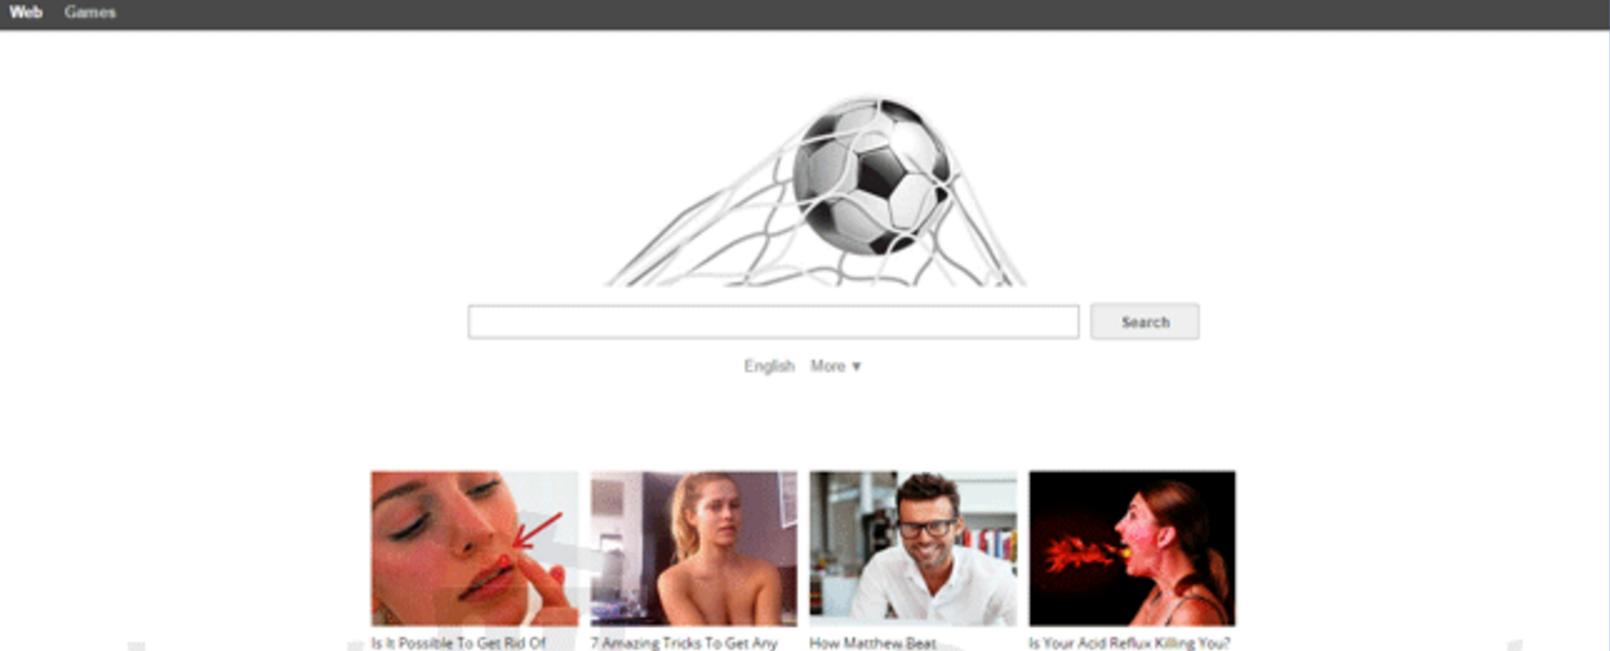 kilo-search.com ads